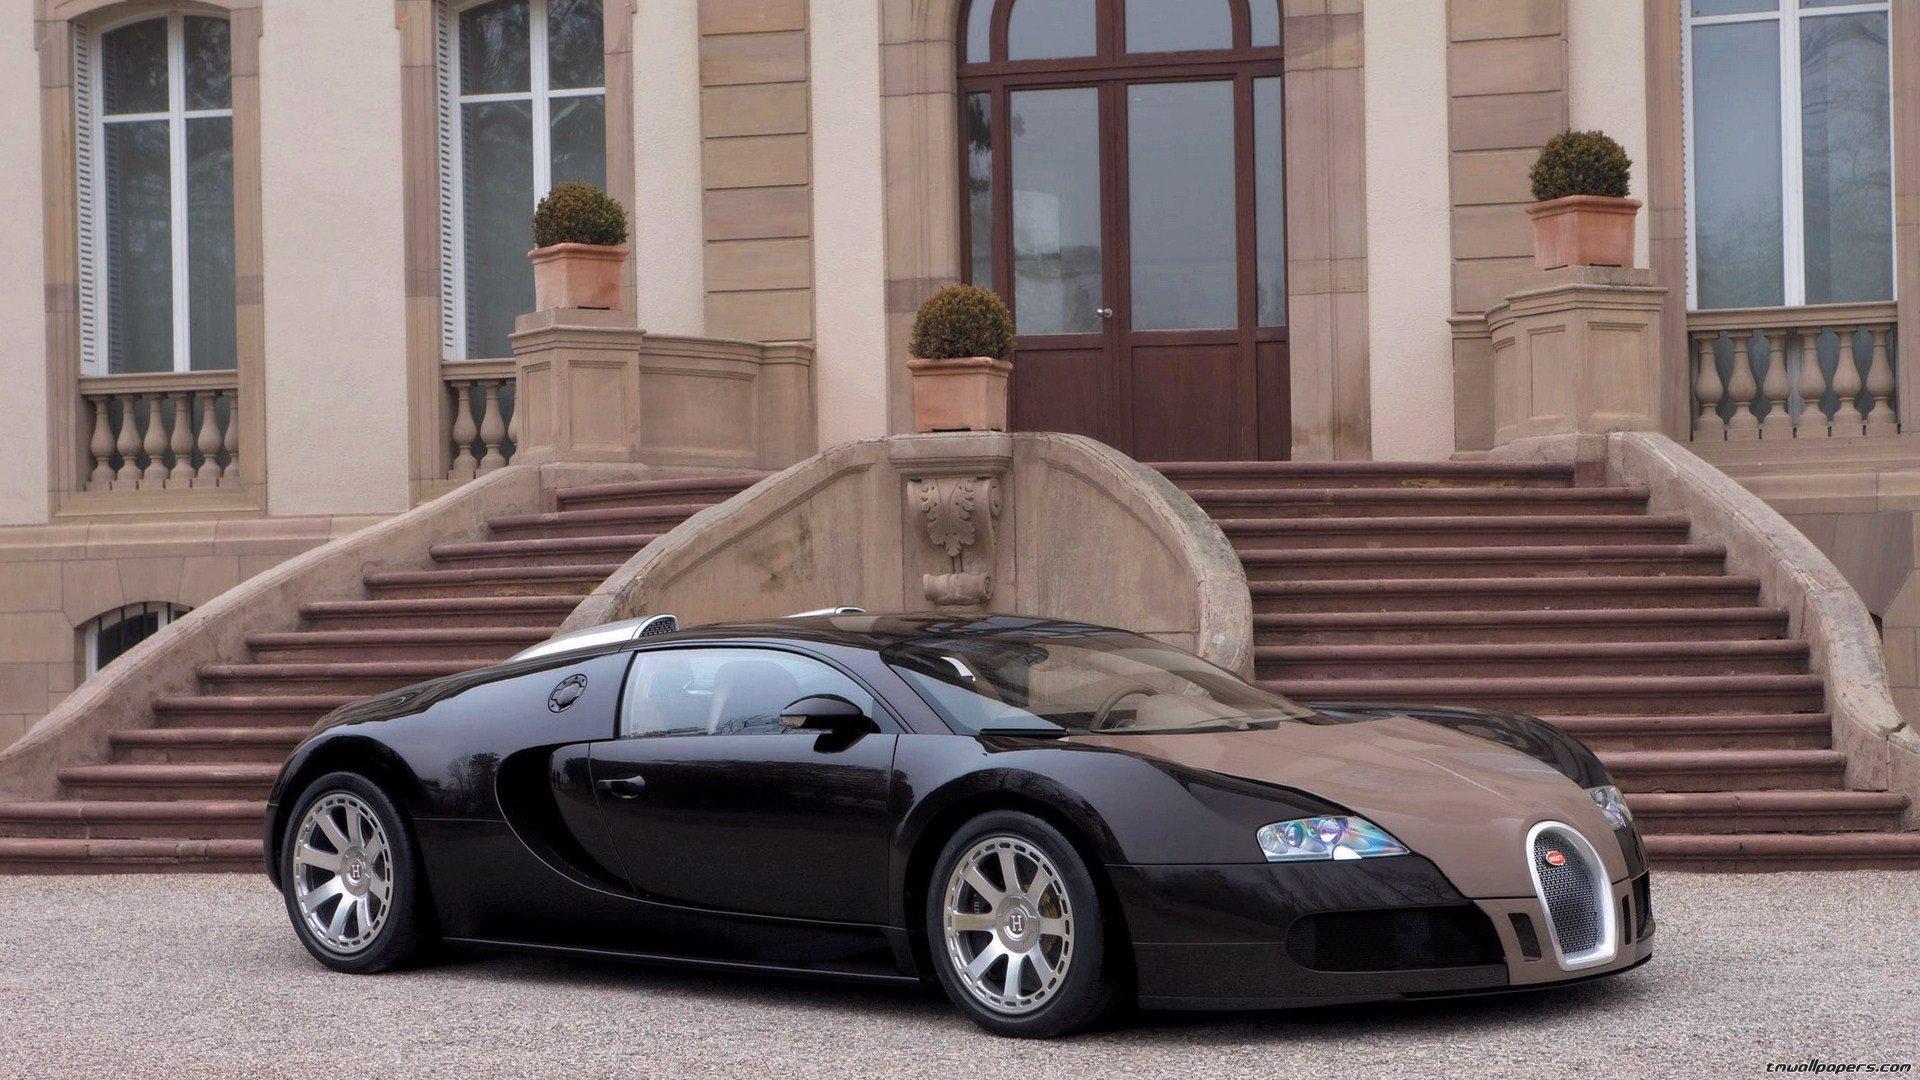 Bugatti hd wallpaper 1080